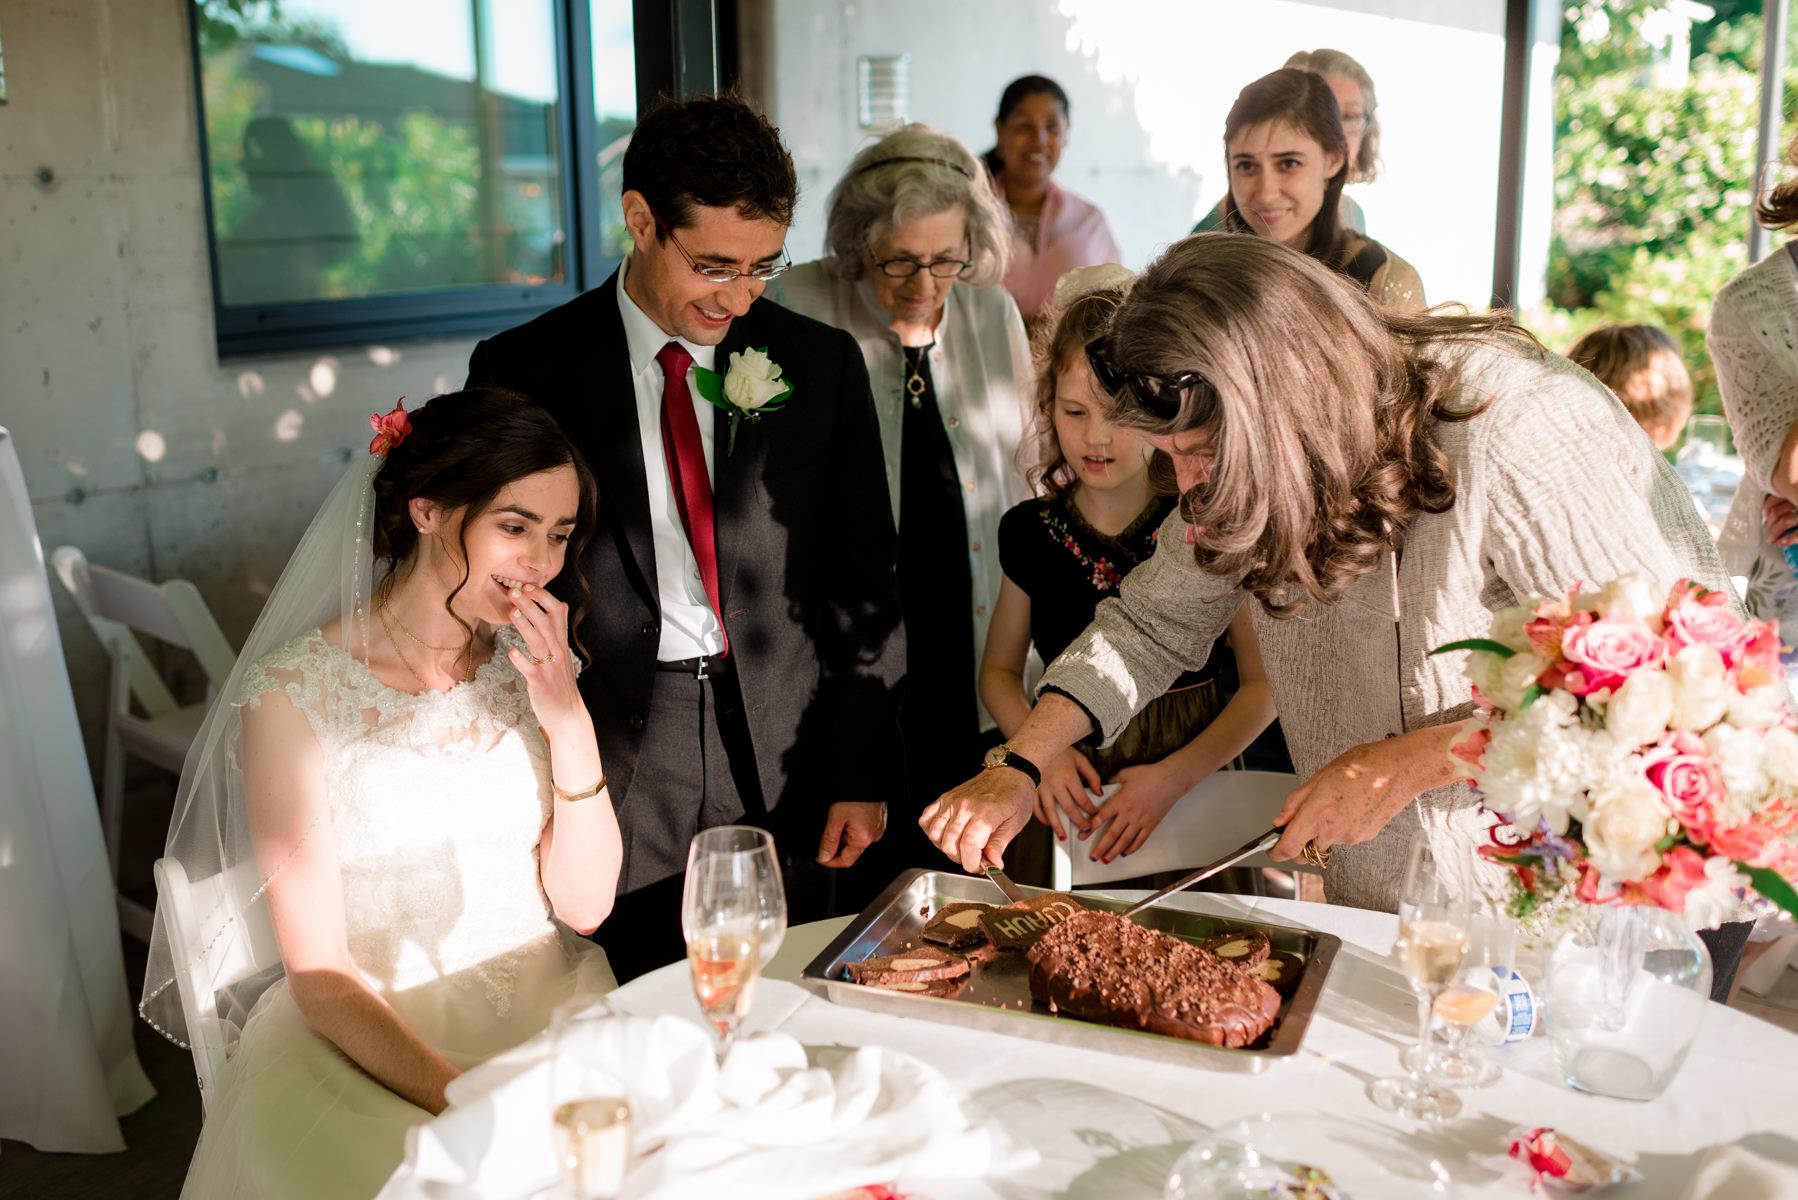 Andrew Tat - Documentary Wedding Photography - Kirkland, Washington - Emily & Cuauh - 37.JPG